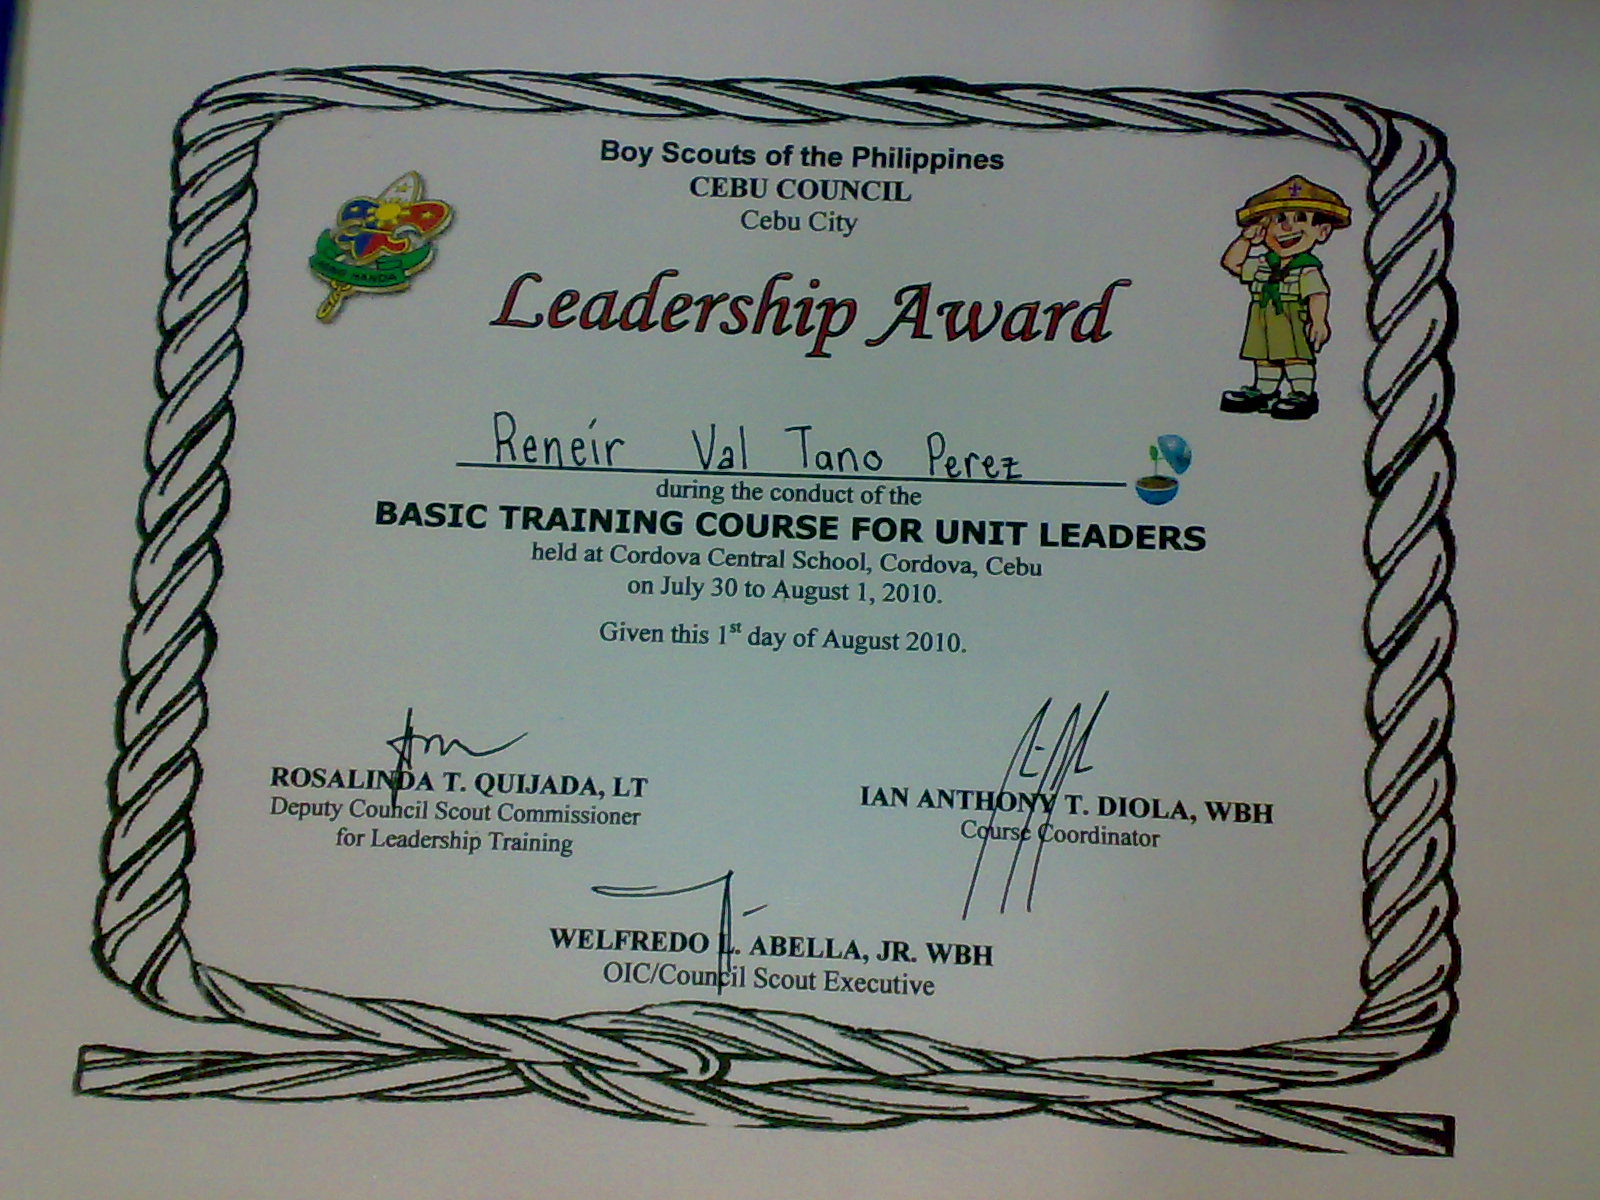 Boy Scout Certificate Templates - mandegar.info